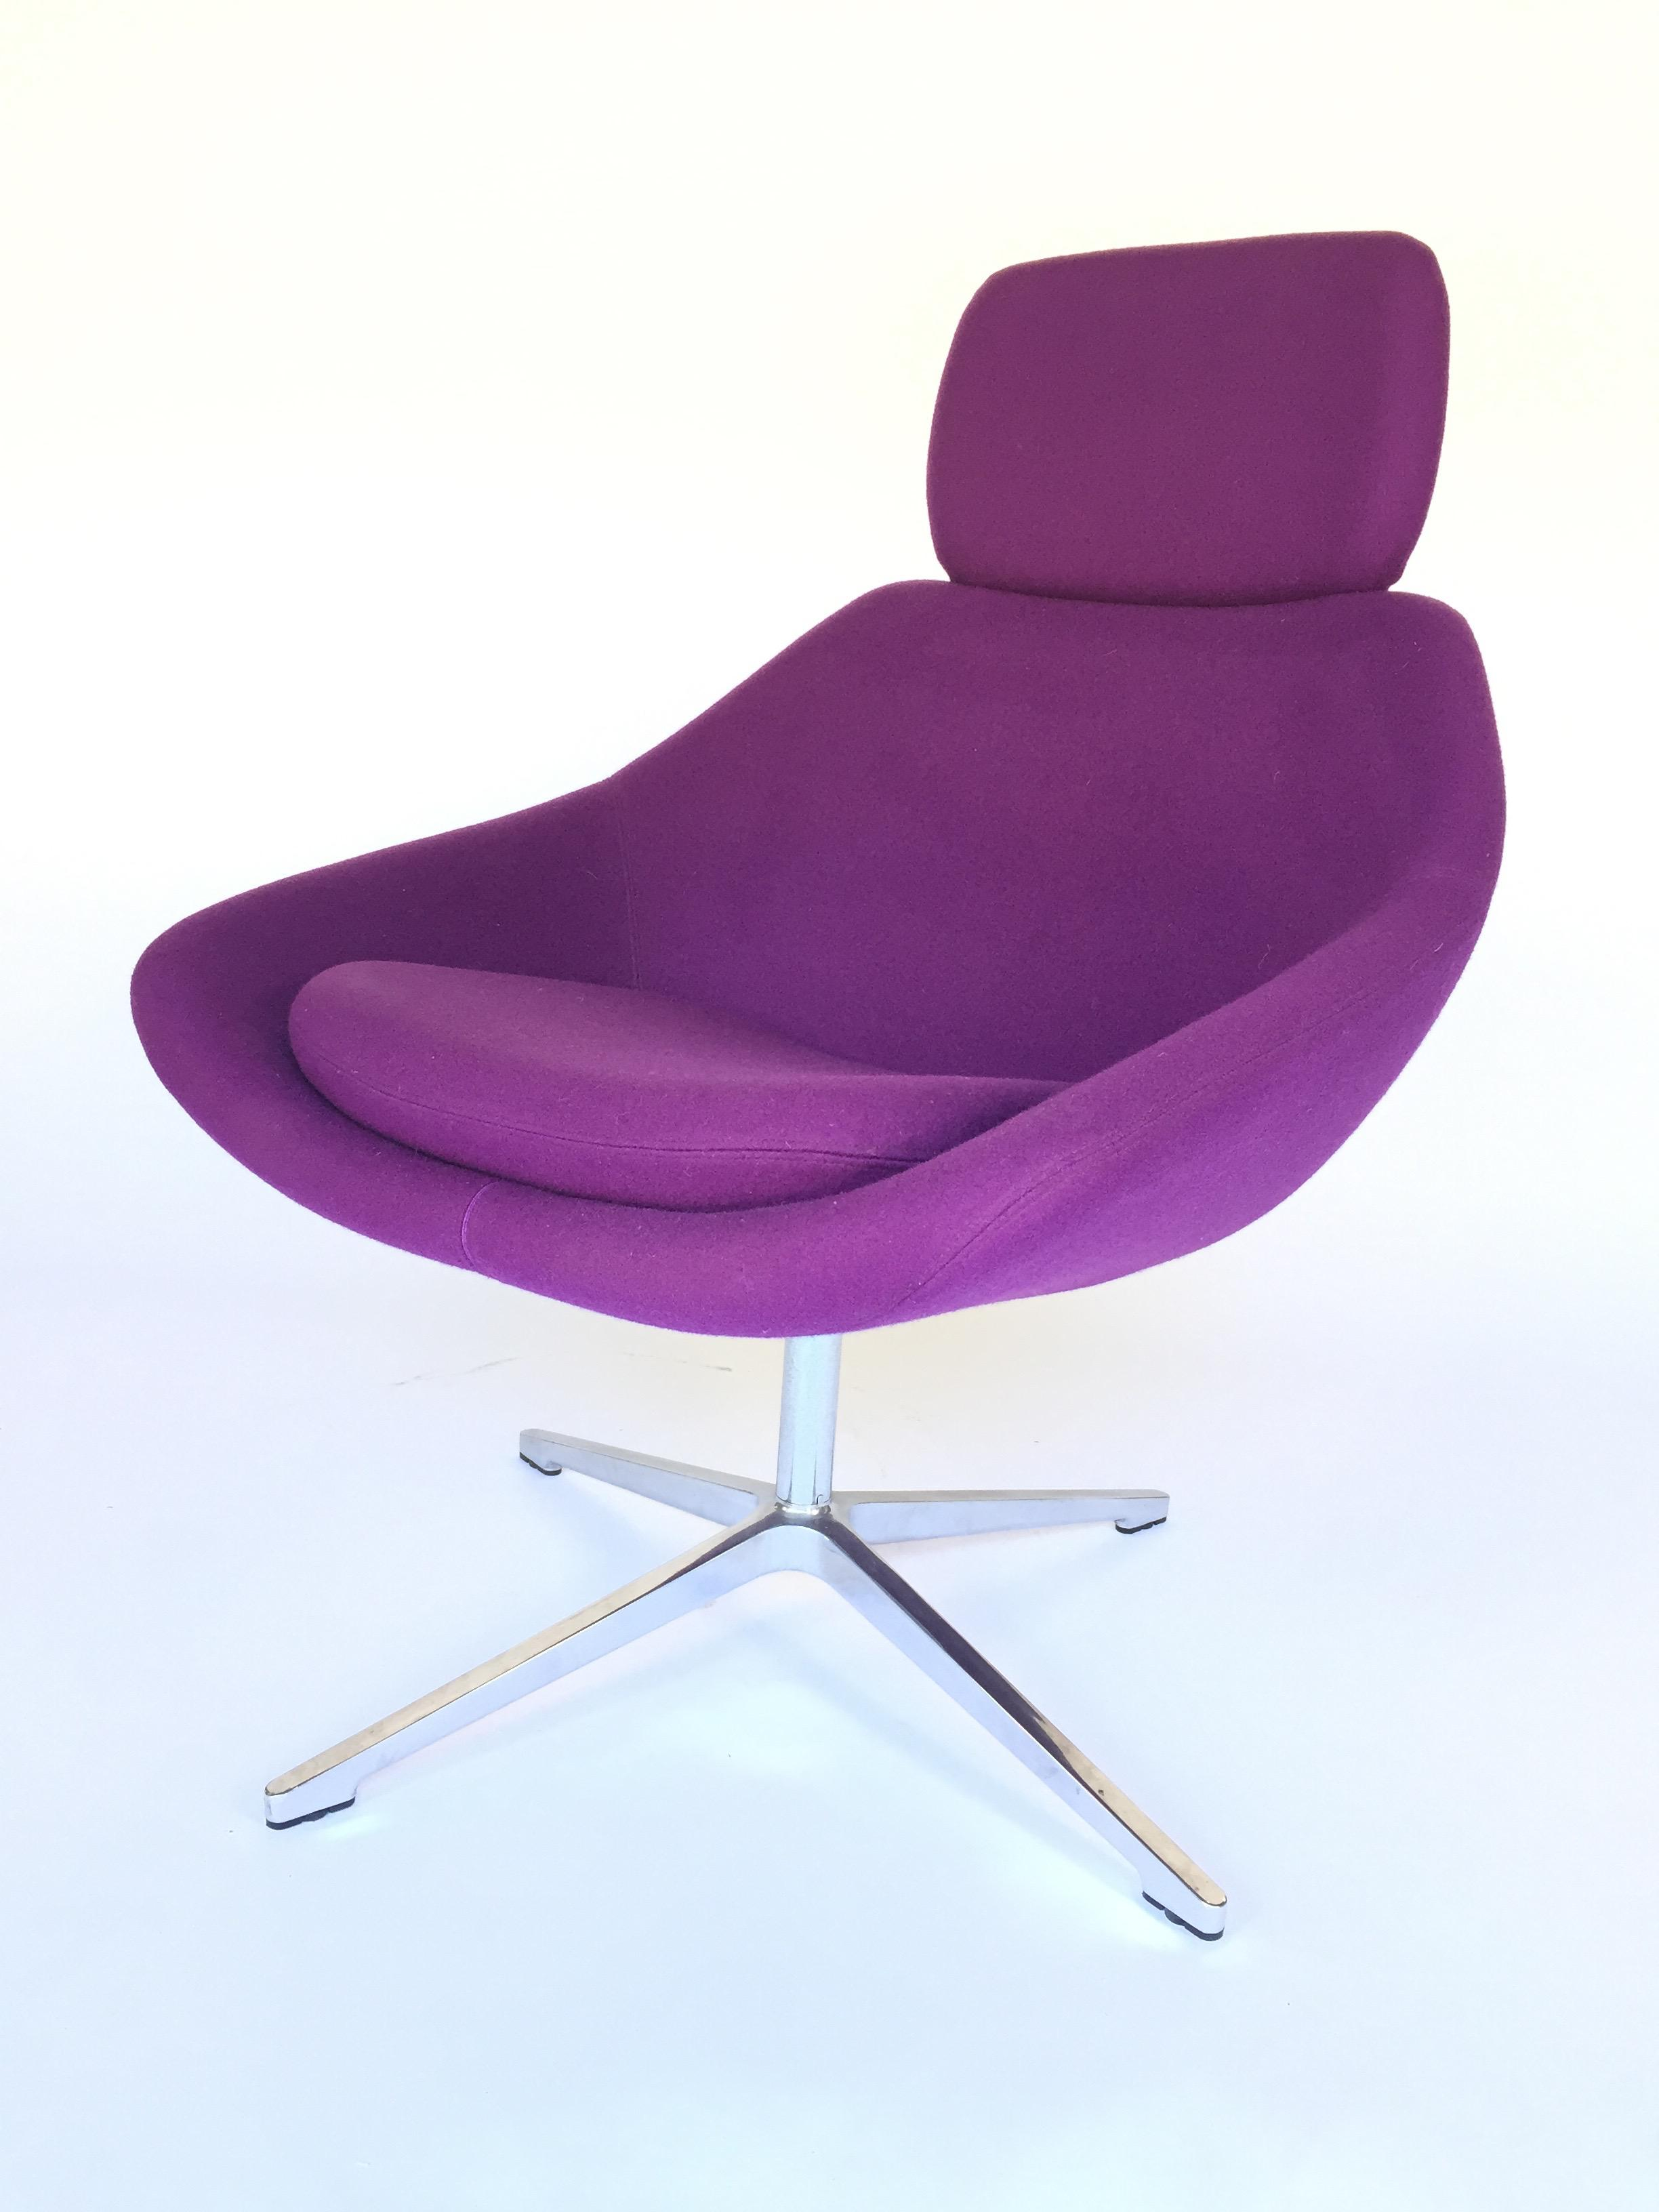 Bon Mid Century Modern Allermuir Purple Swivel Chair For Sale   Image 3 Of 6